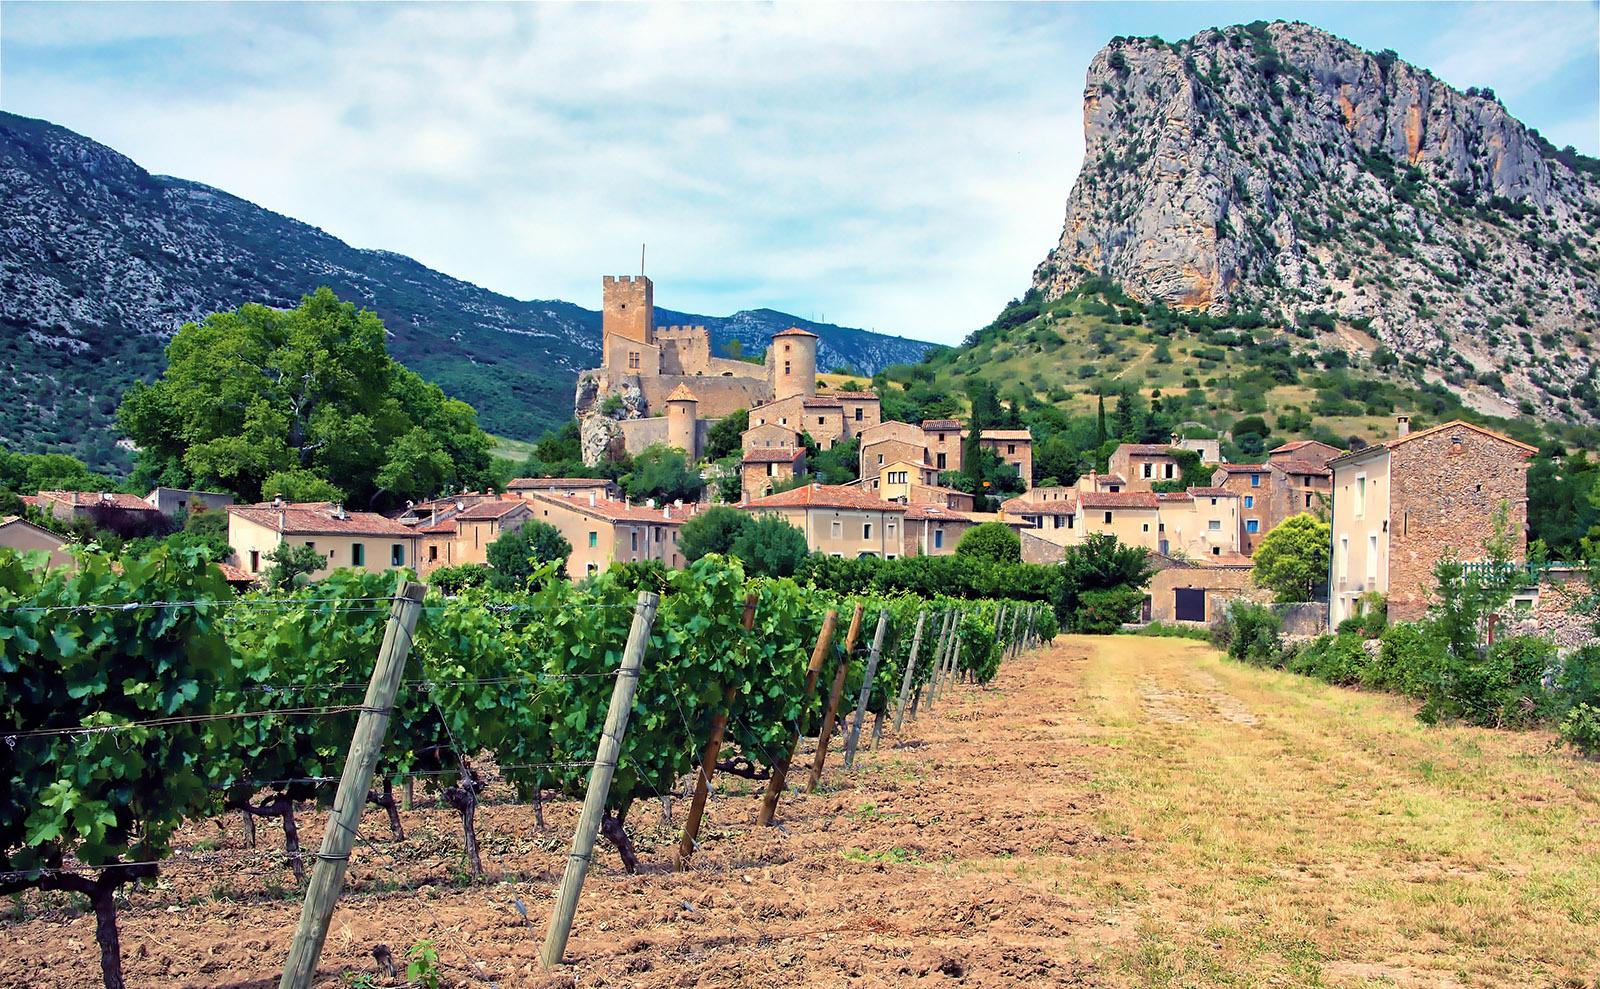 vineyards in the village of Saint Jean de Bueges in Languedoc, France